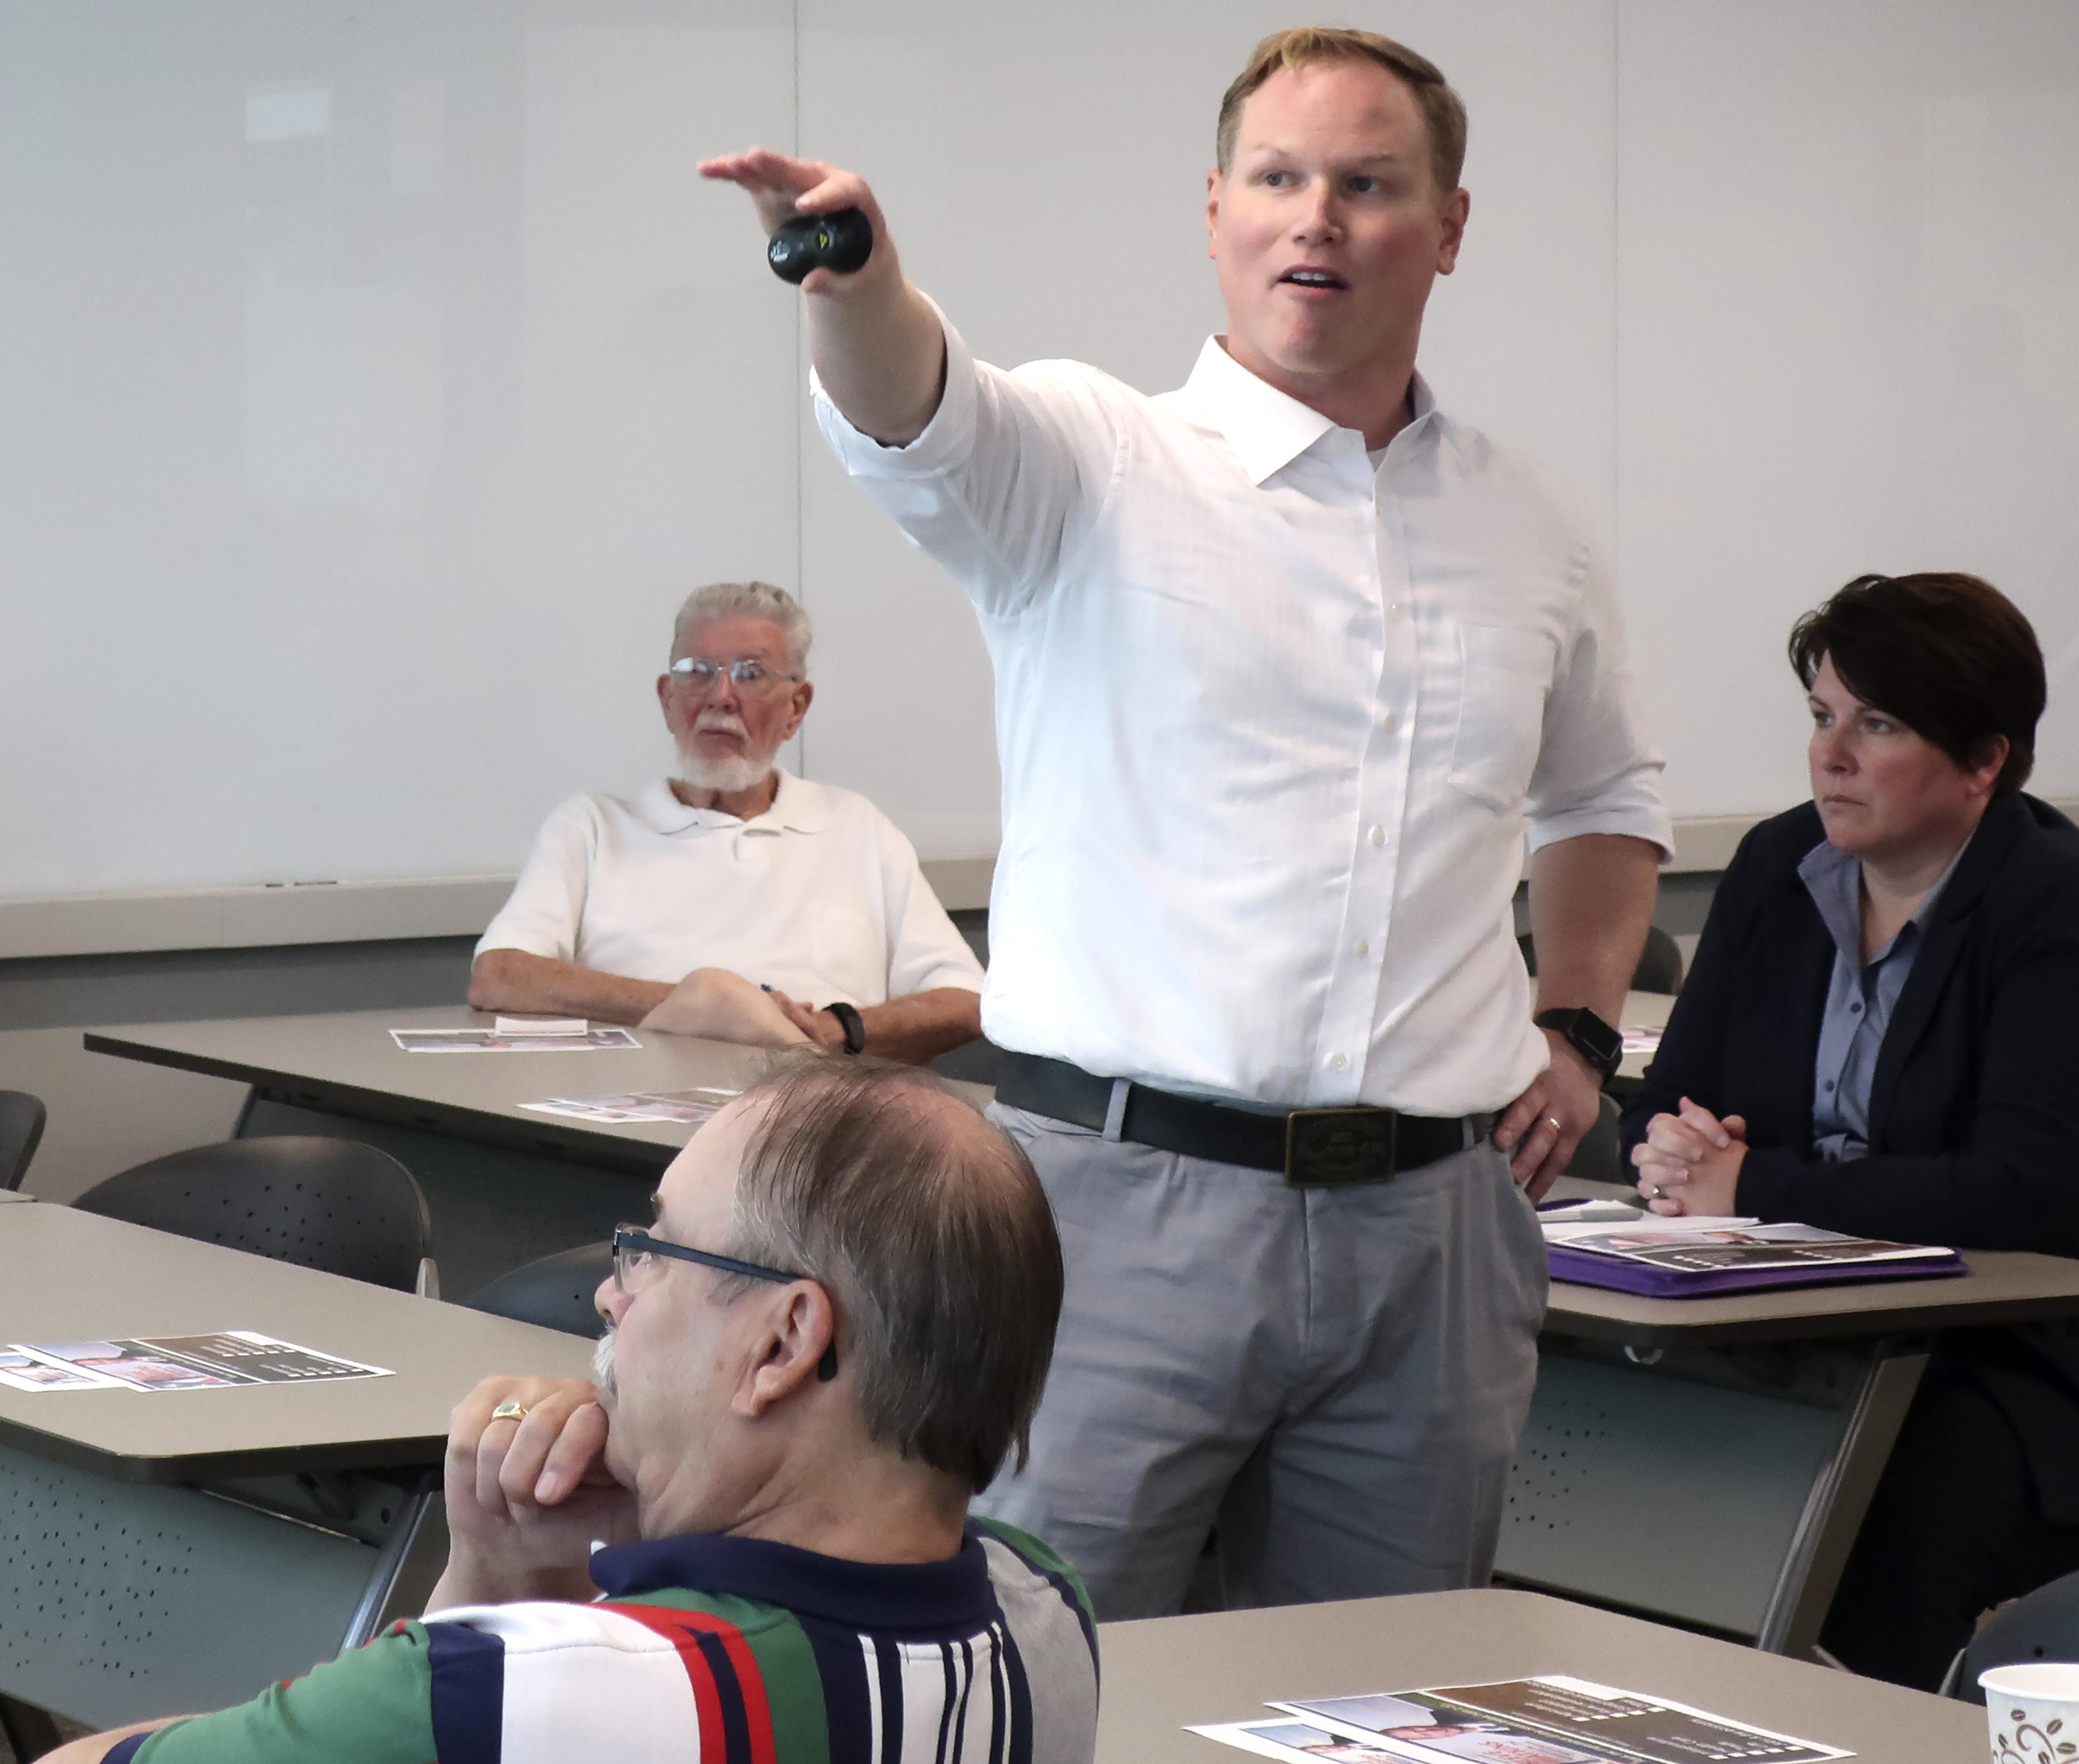 Kansas GOP congressman faces probe of voter registration